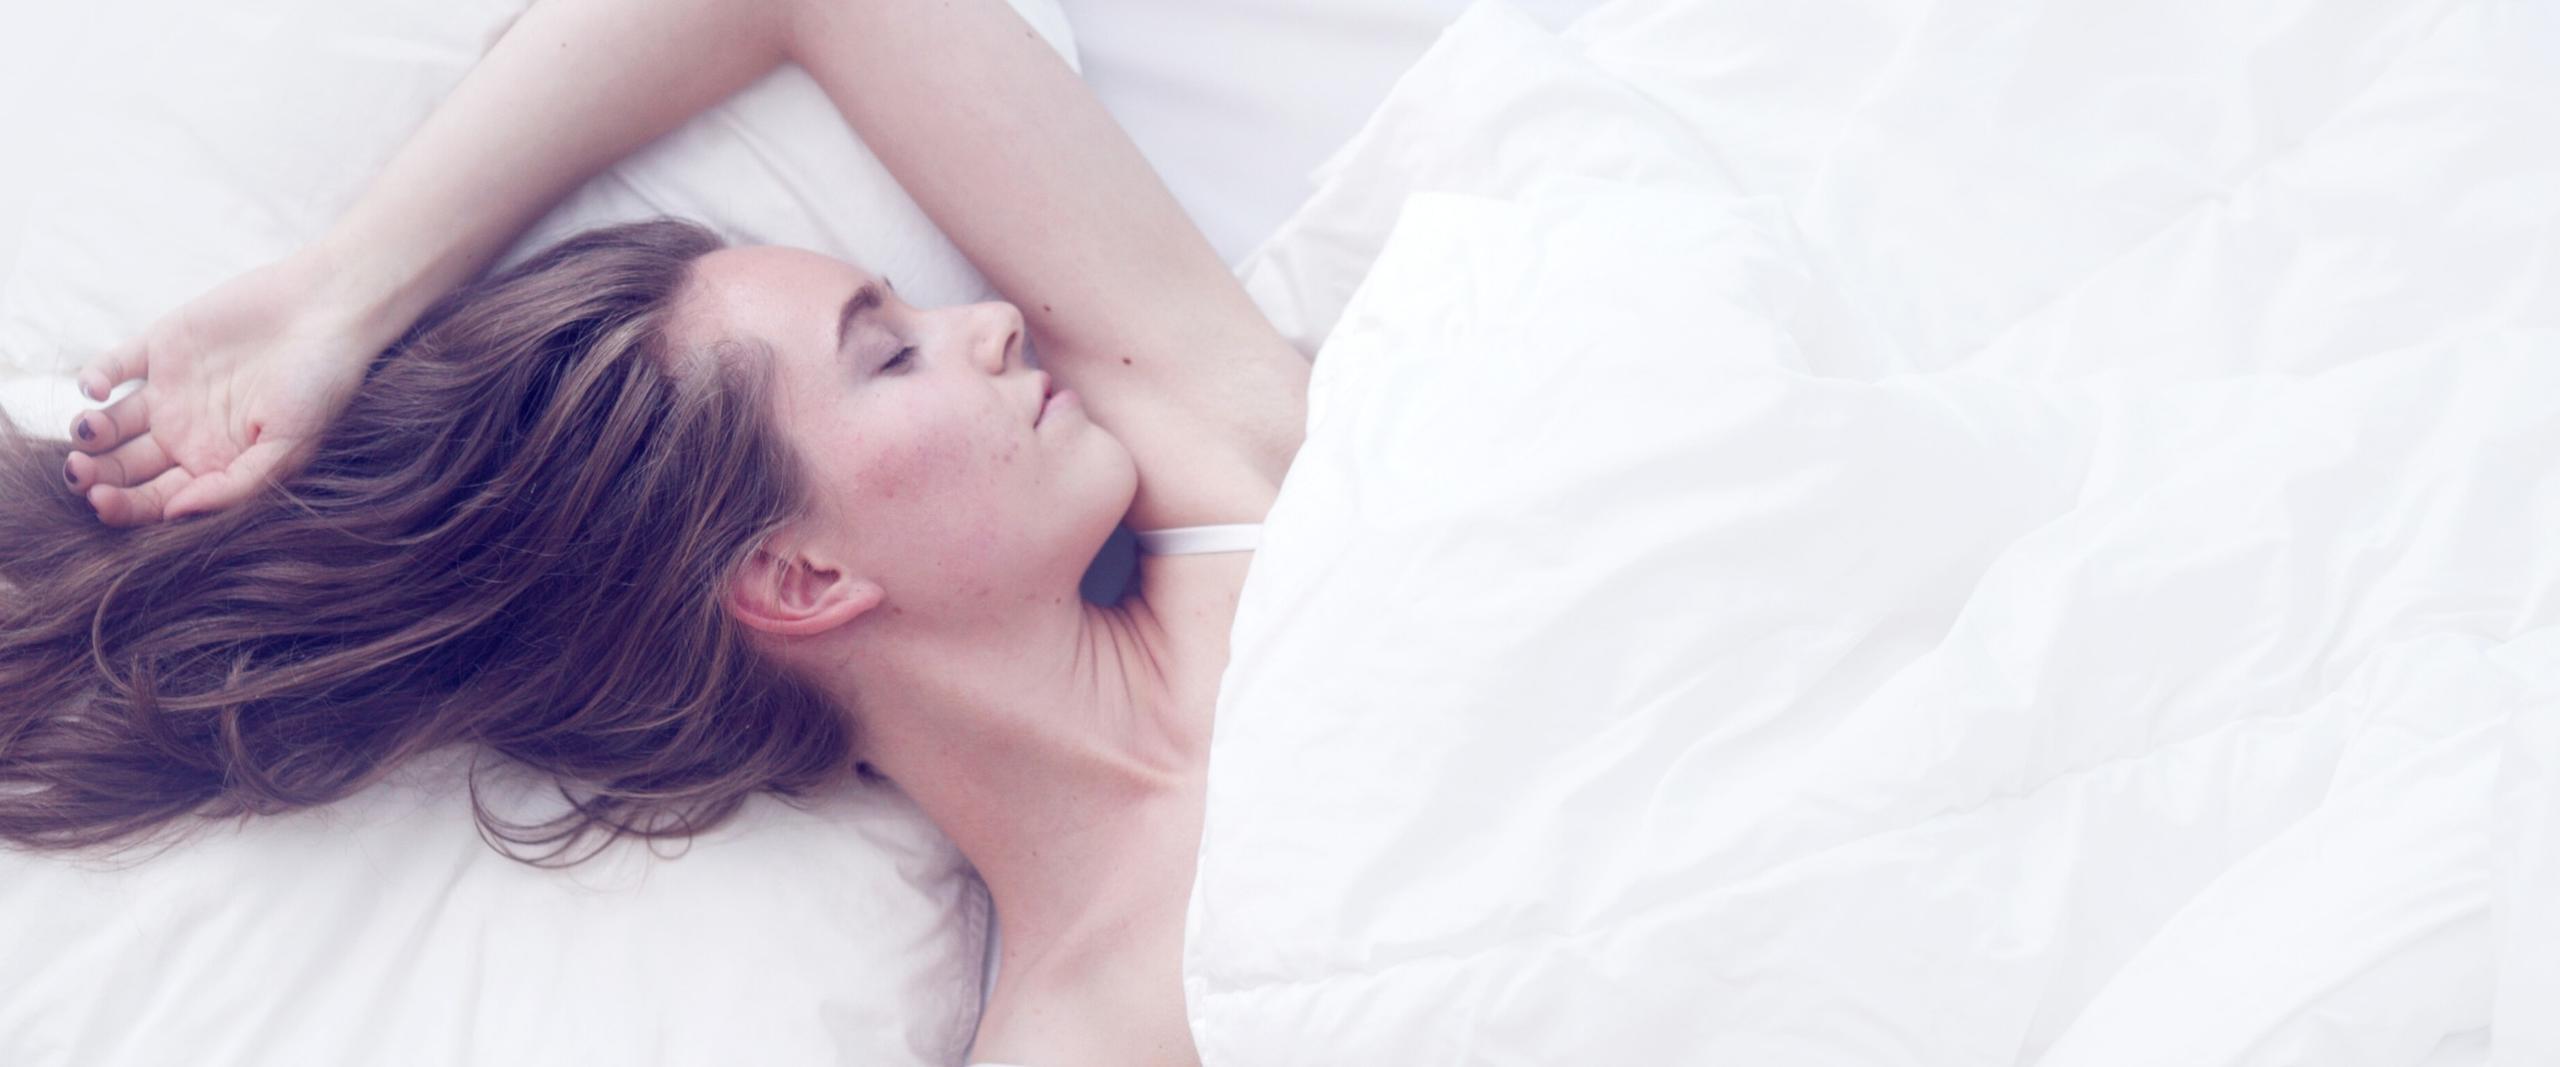 sleep hypnosis recording